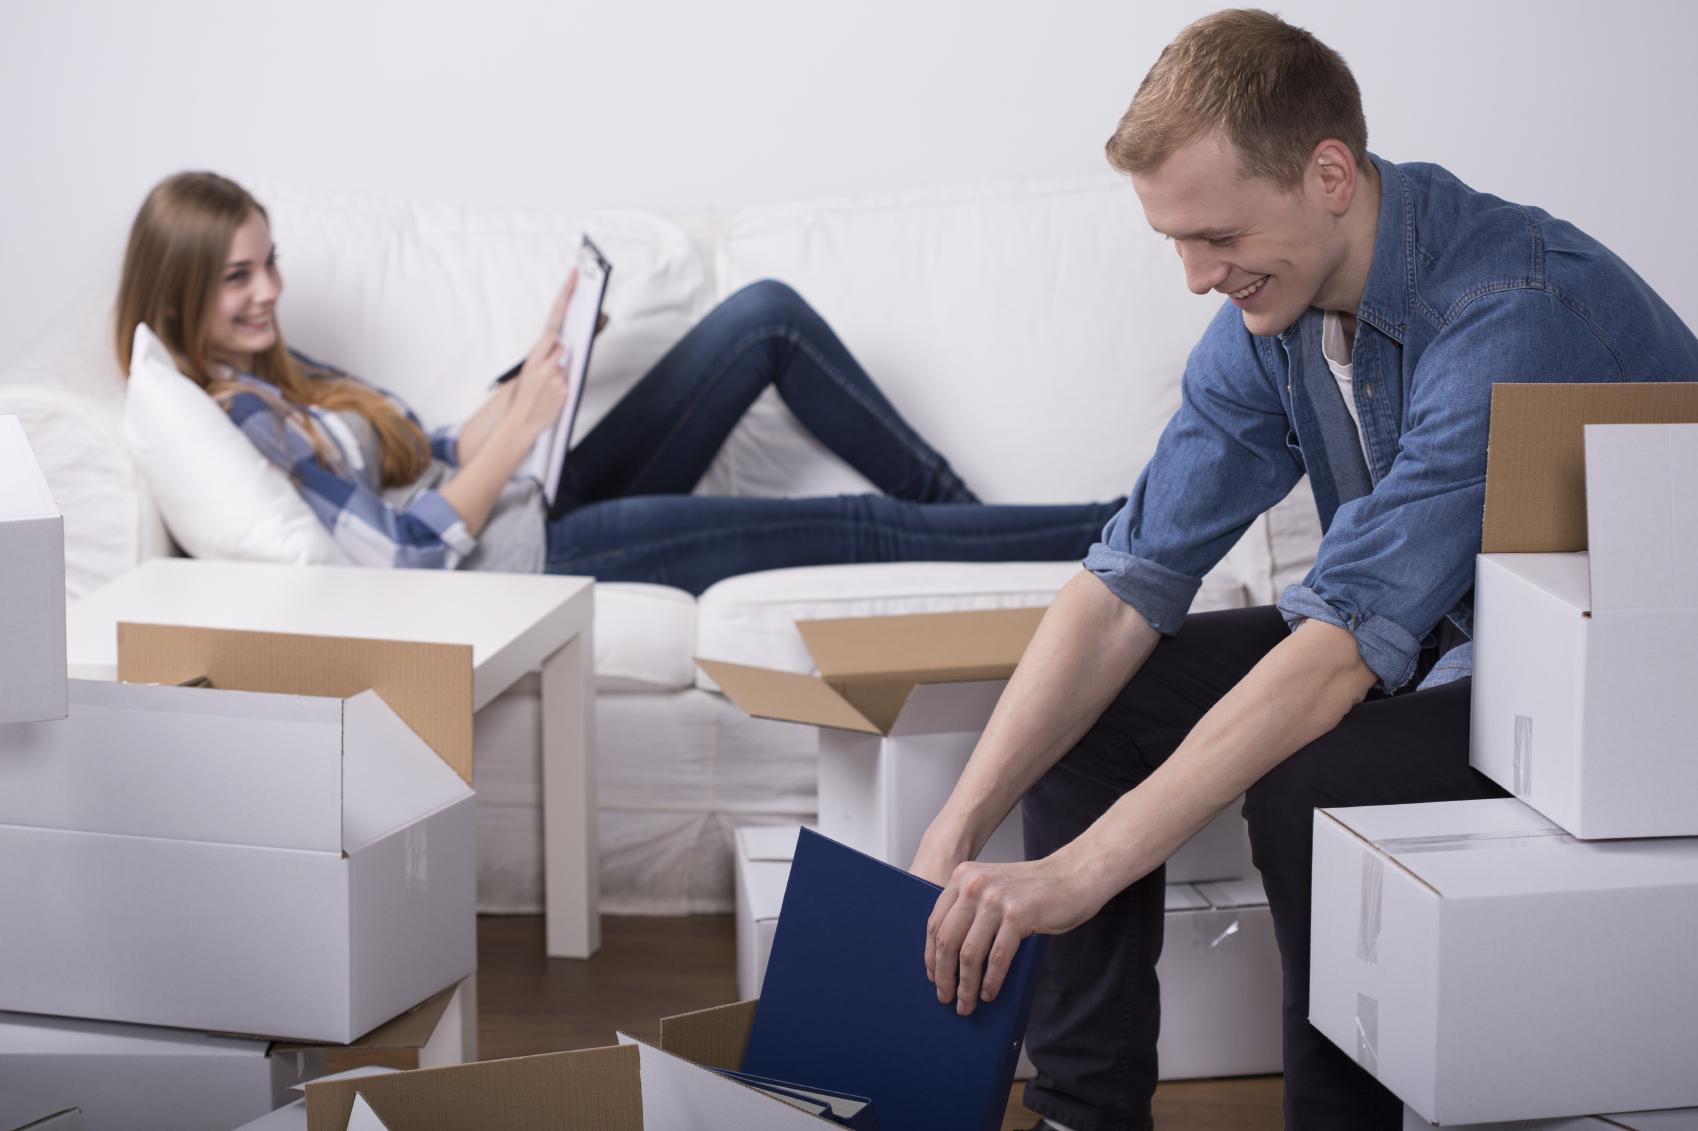 umzug effizient organisieren so gelingt die umzugsplanung garantiert. Black Bedroom Furniture Sets. Home Design Ideas